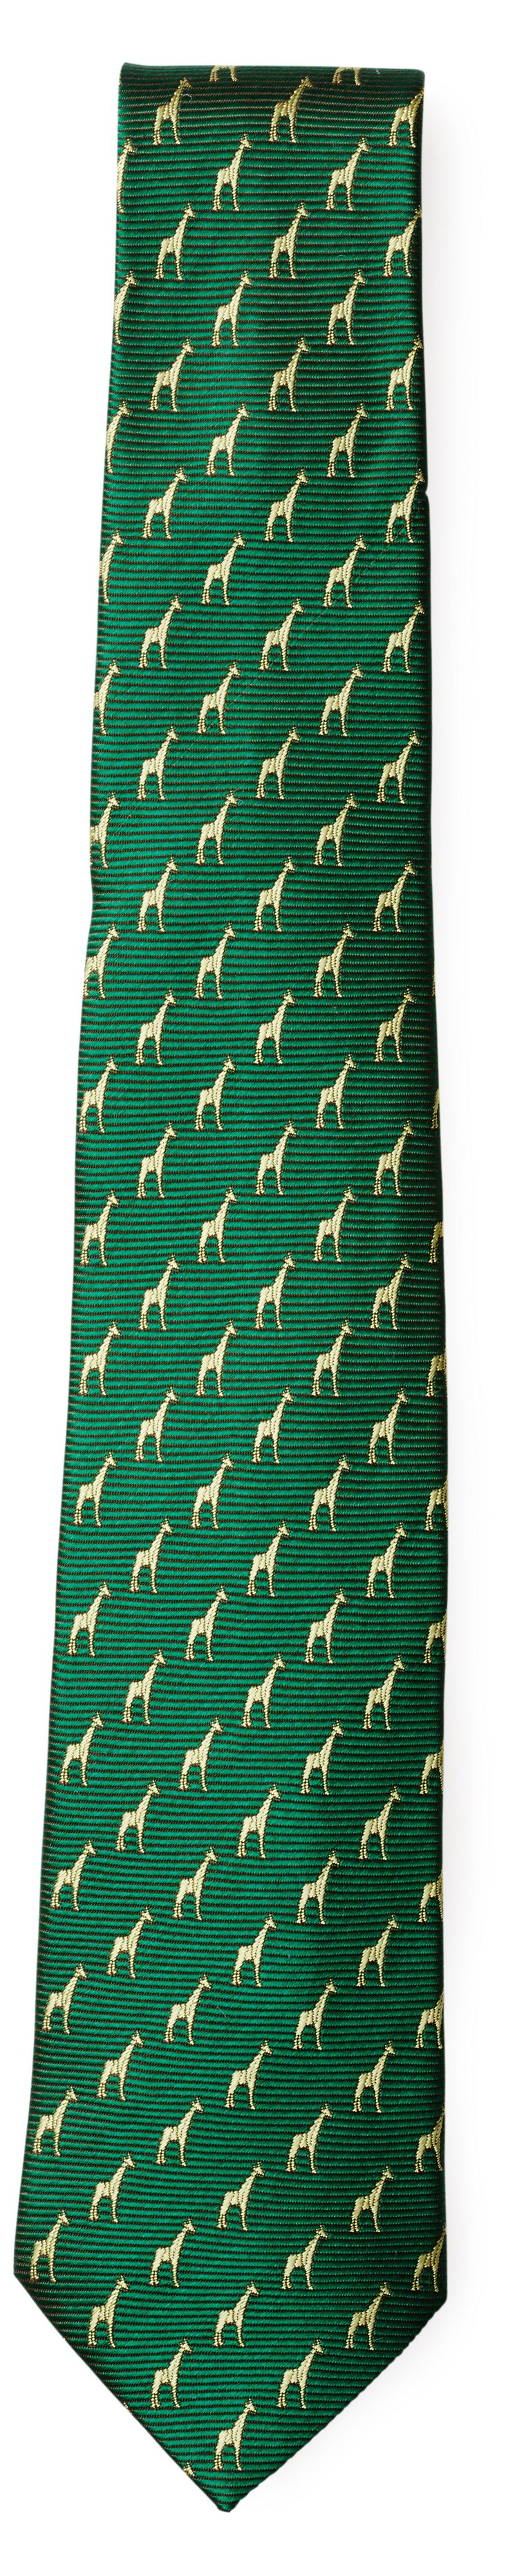 Silk Giraffe Tie, Forest Green